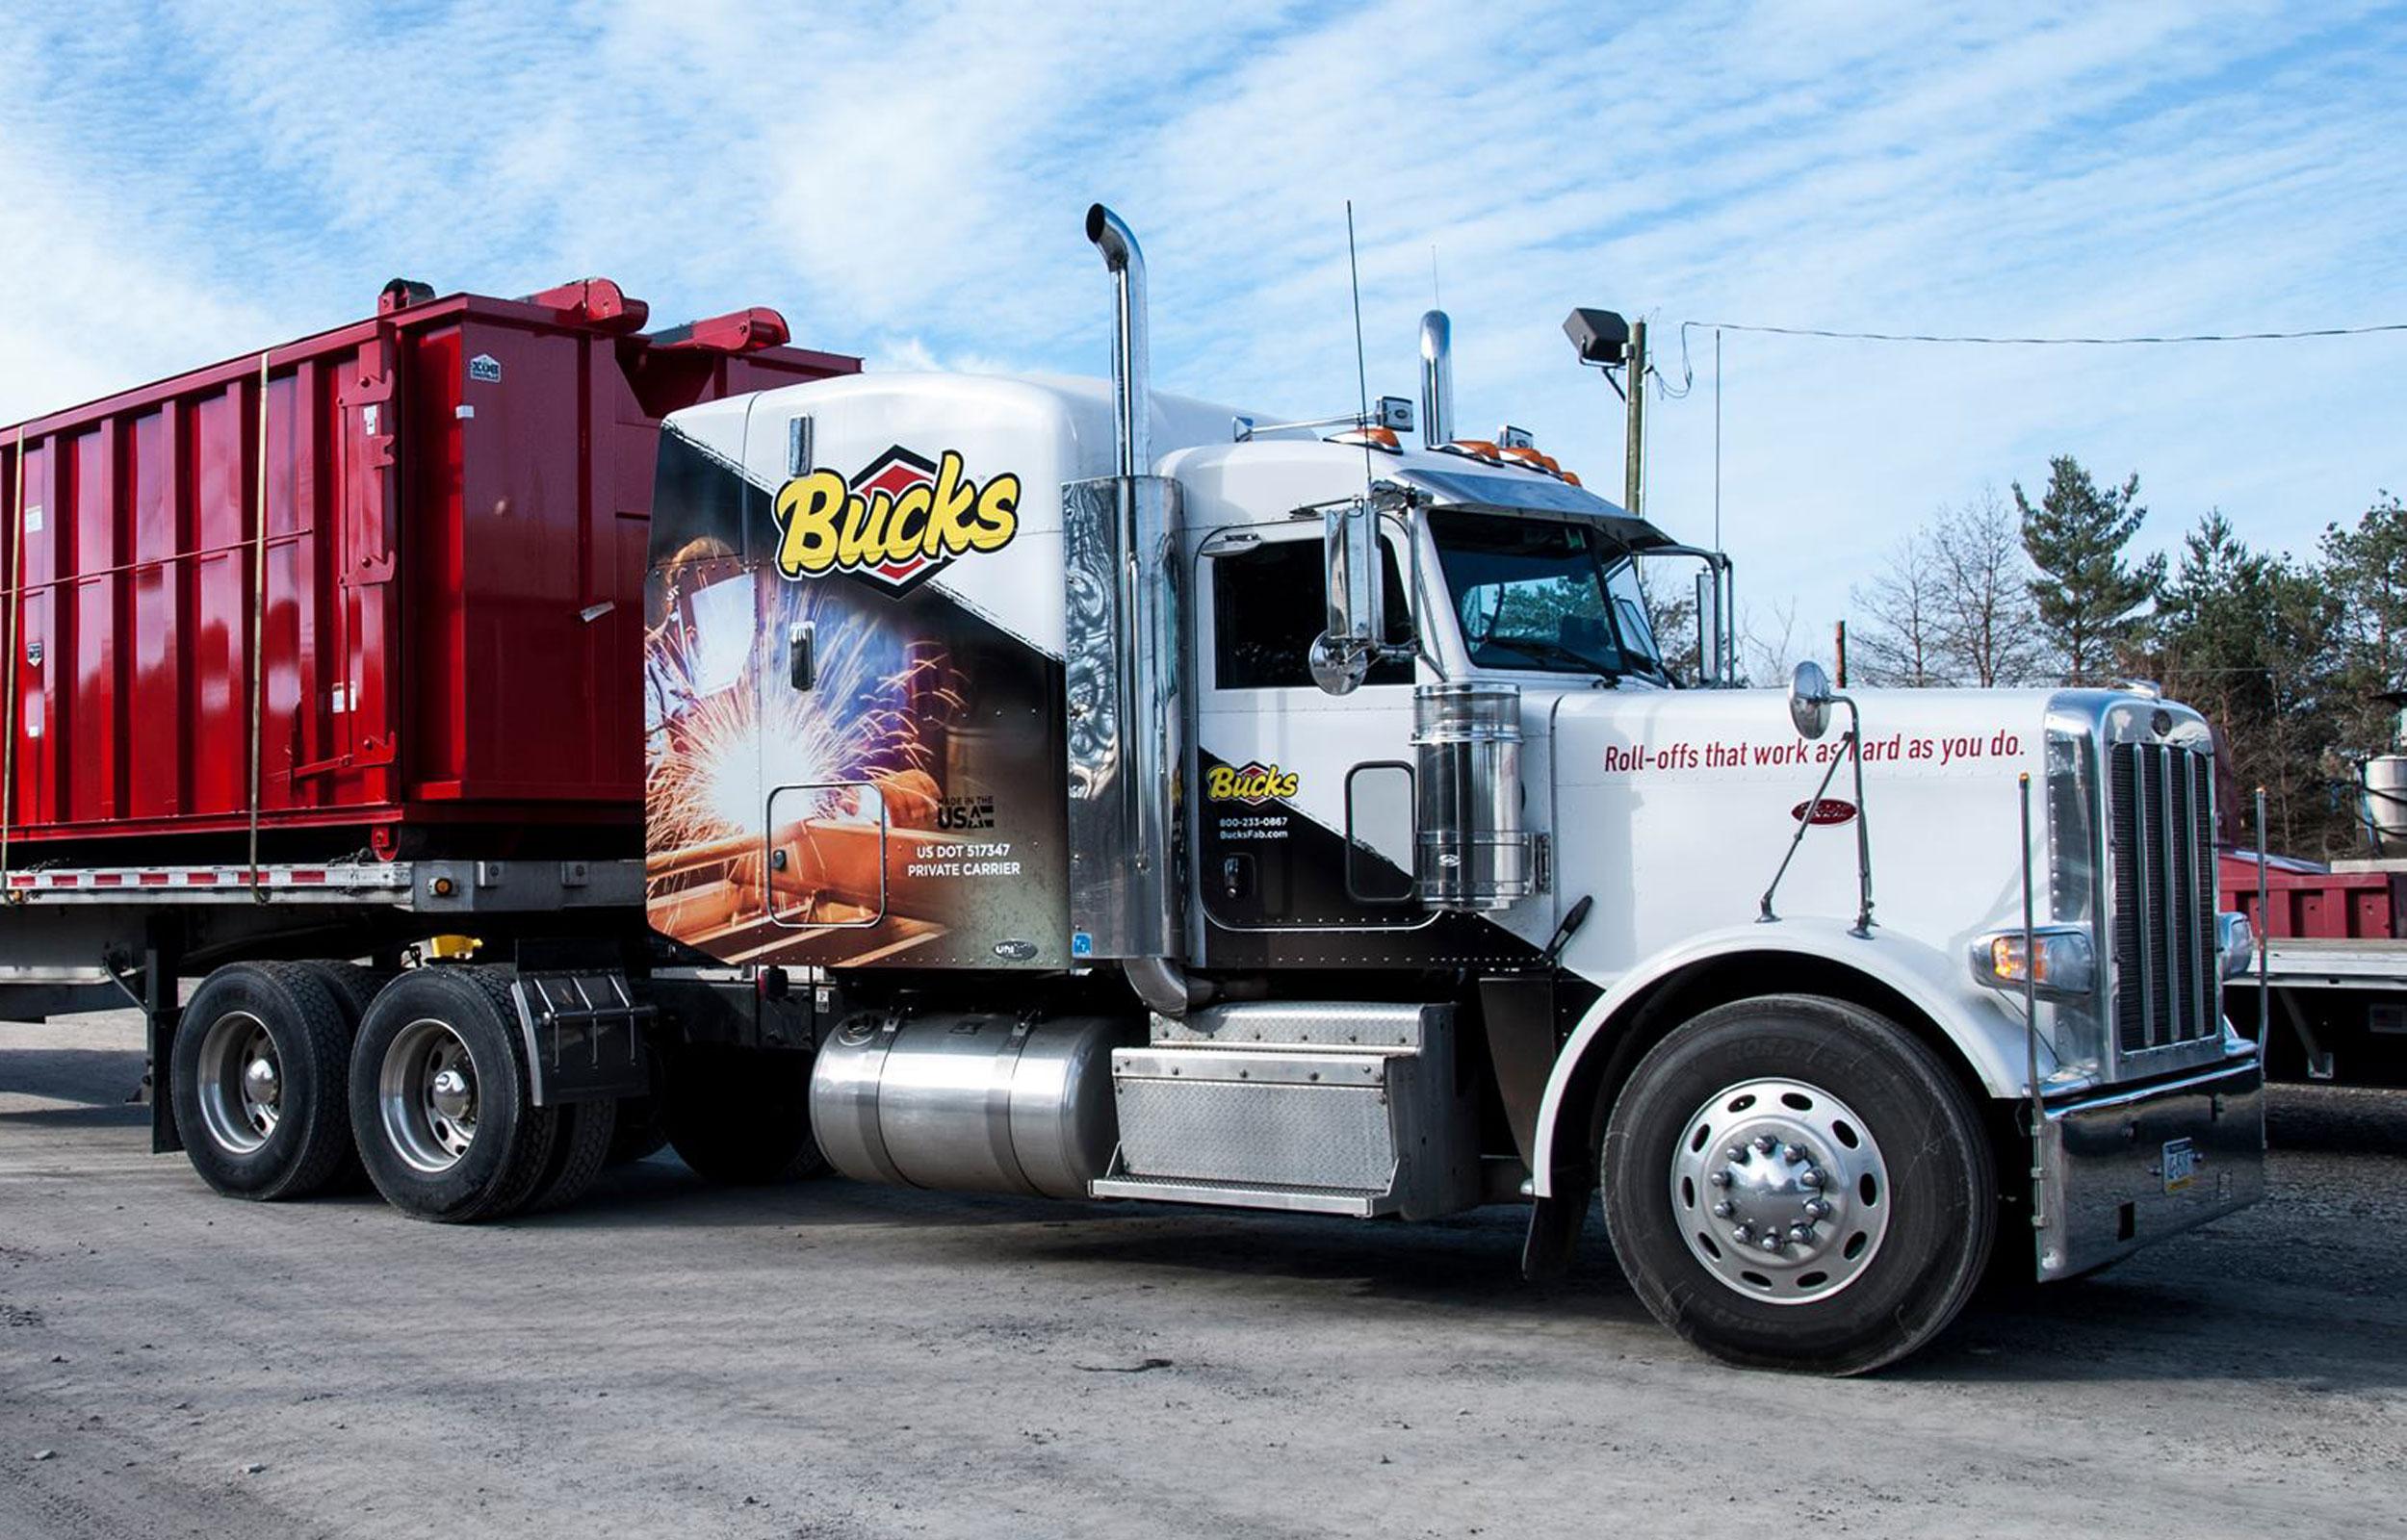 http://papaadvertising.com/wp-content/uploads/2017/01/bucks_truck.jpg